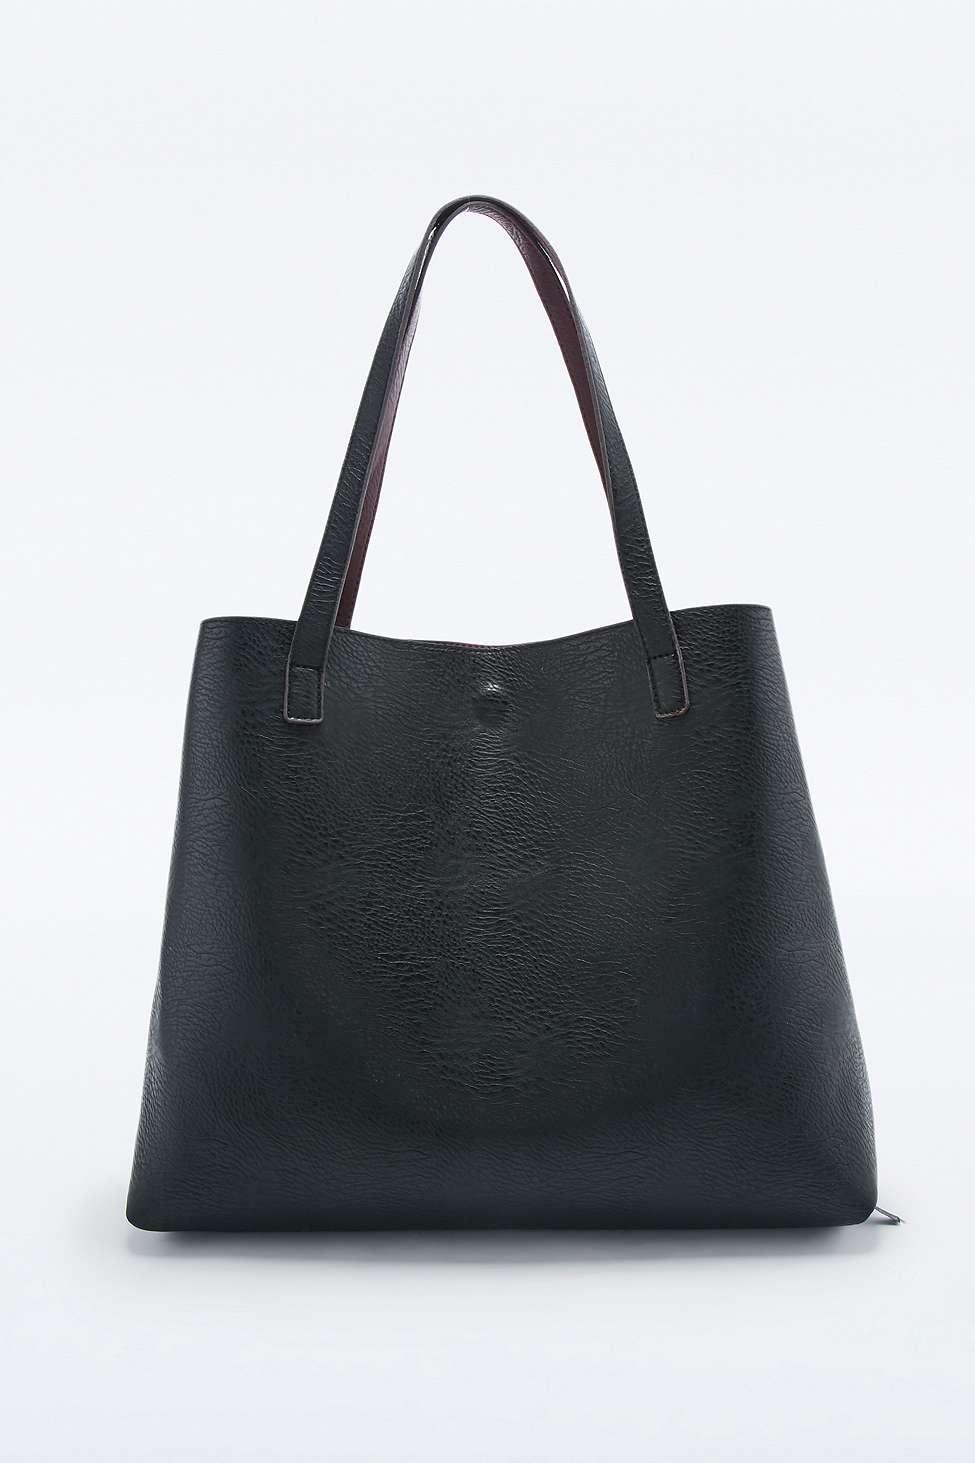 vegan-leather-bag-uo.jpg